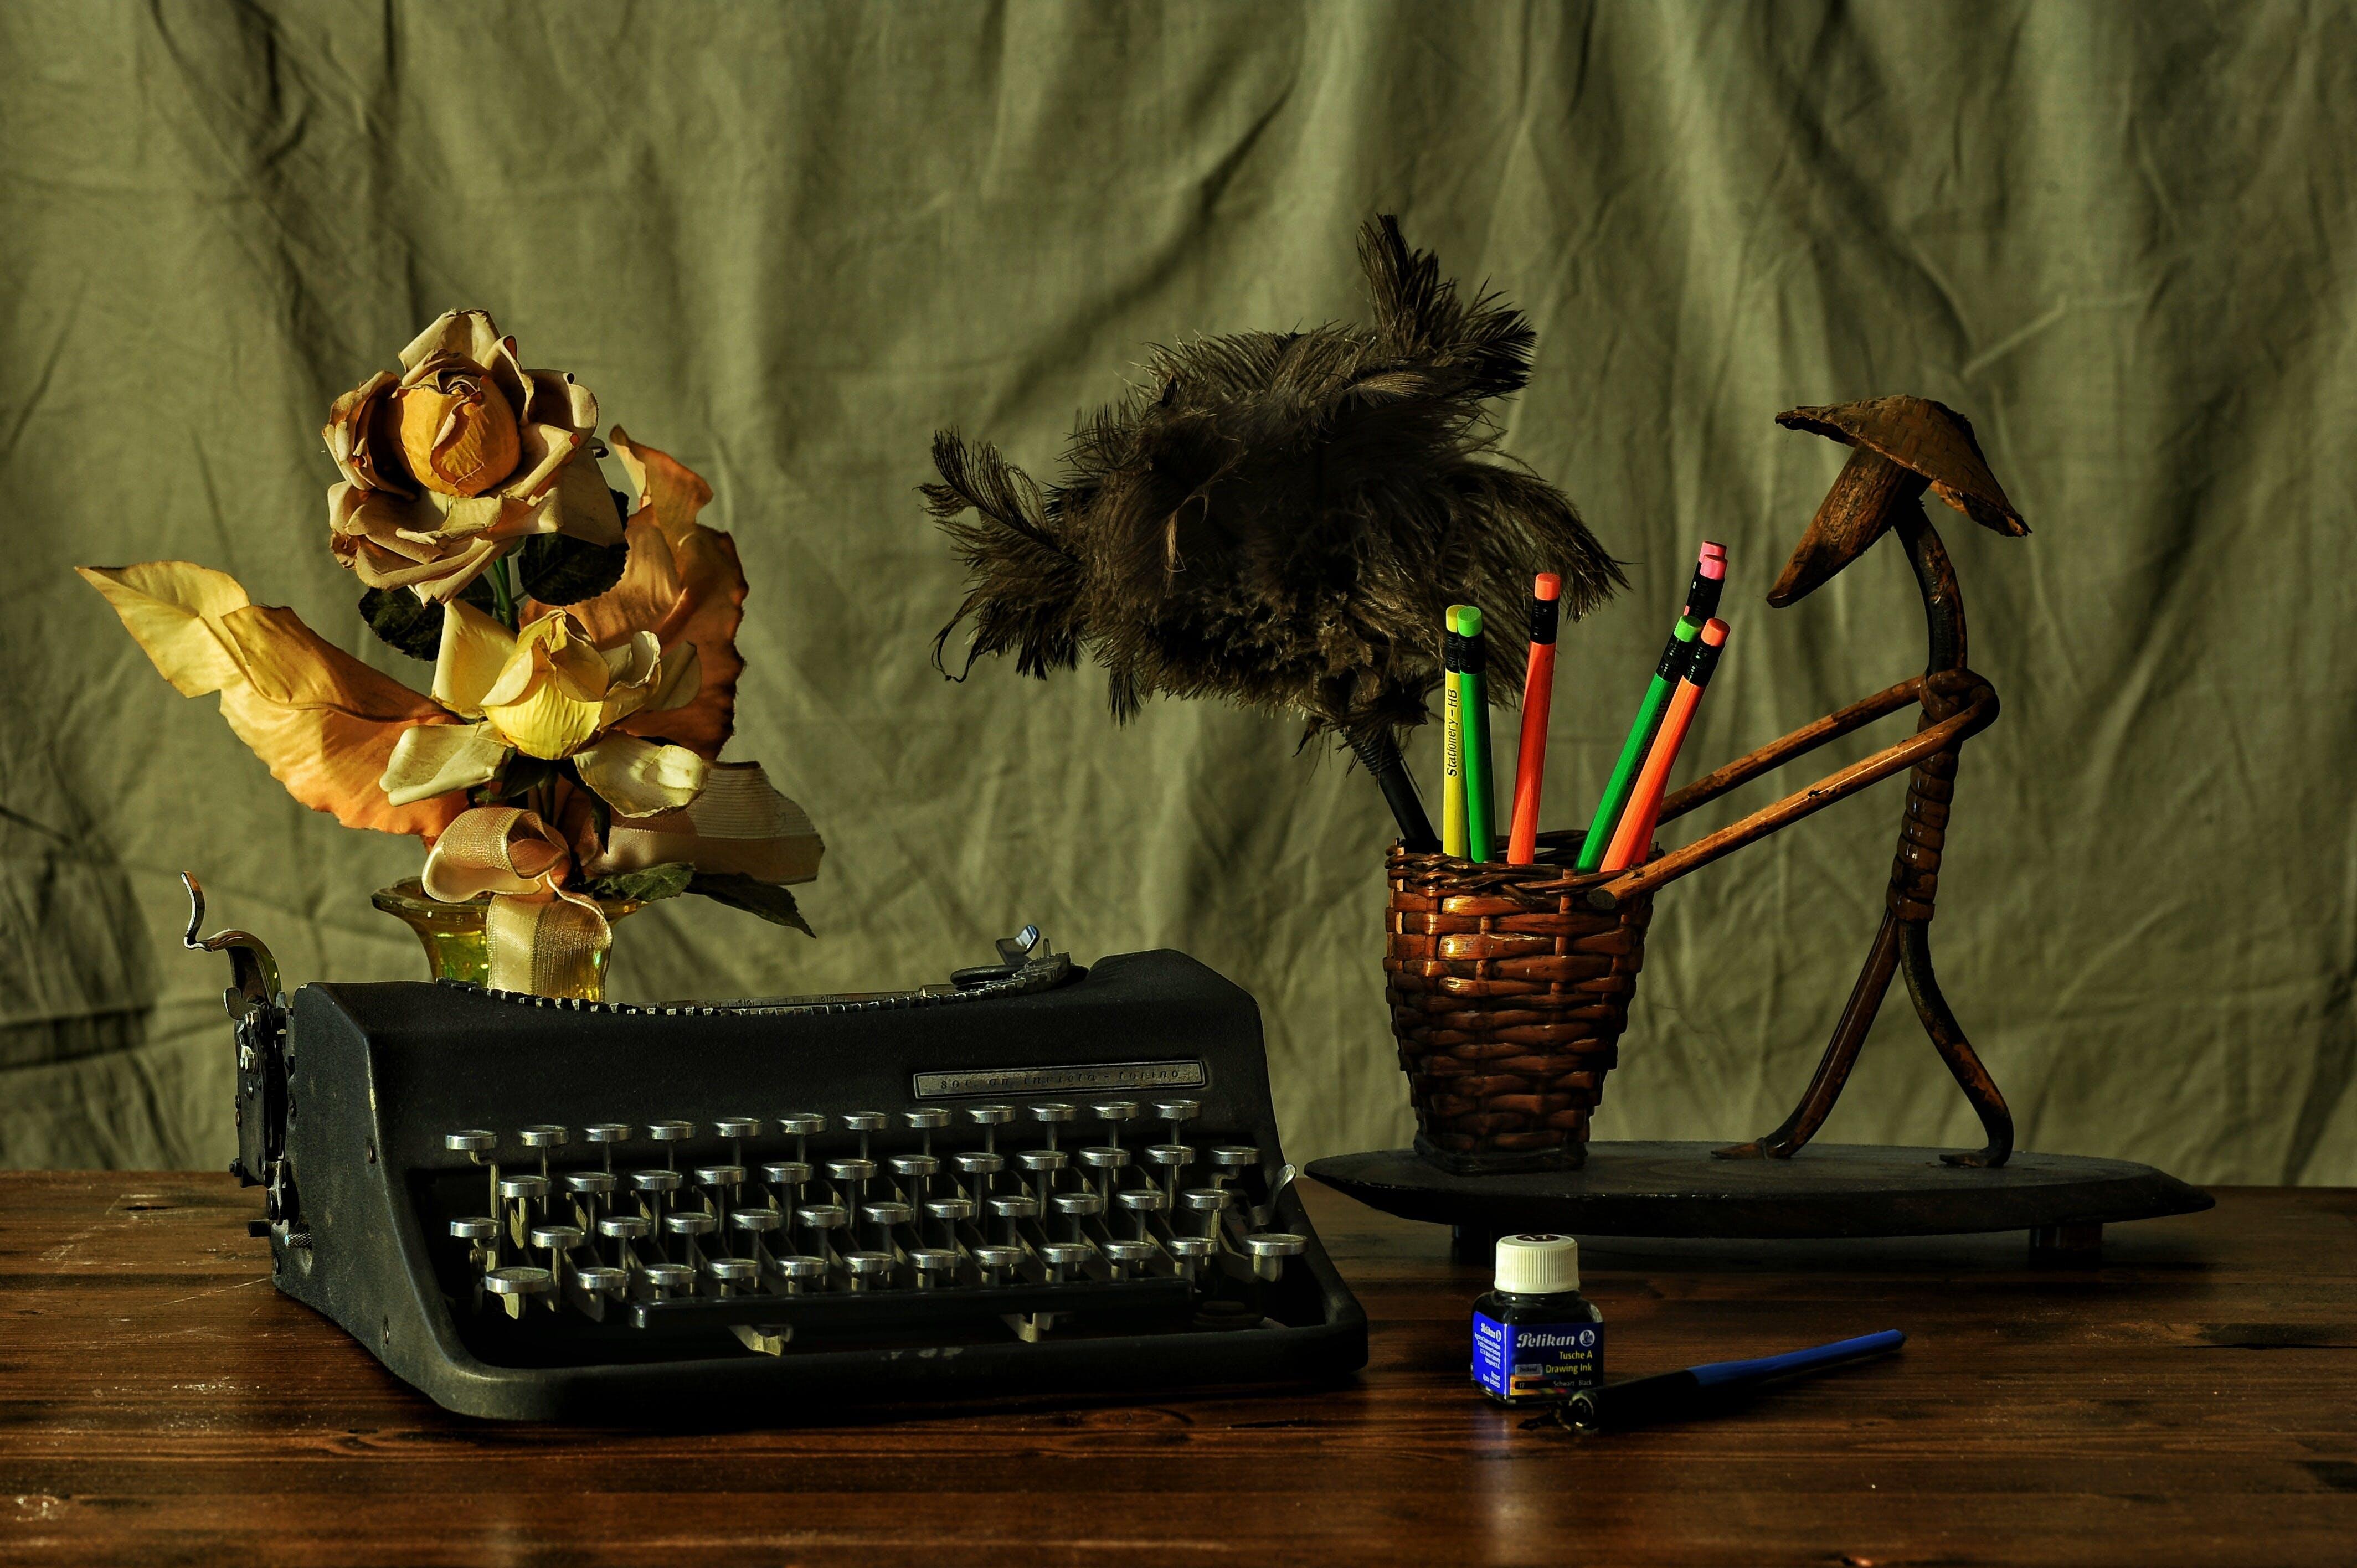 Black Typwriter Near Brown Wicker Pencil Cup